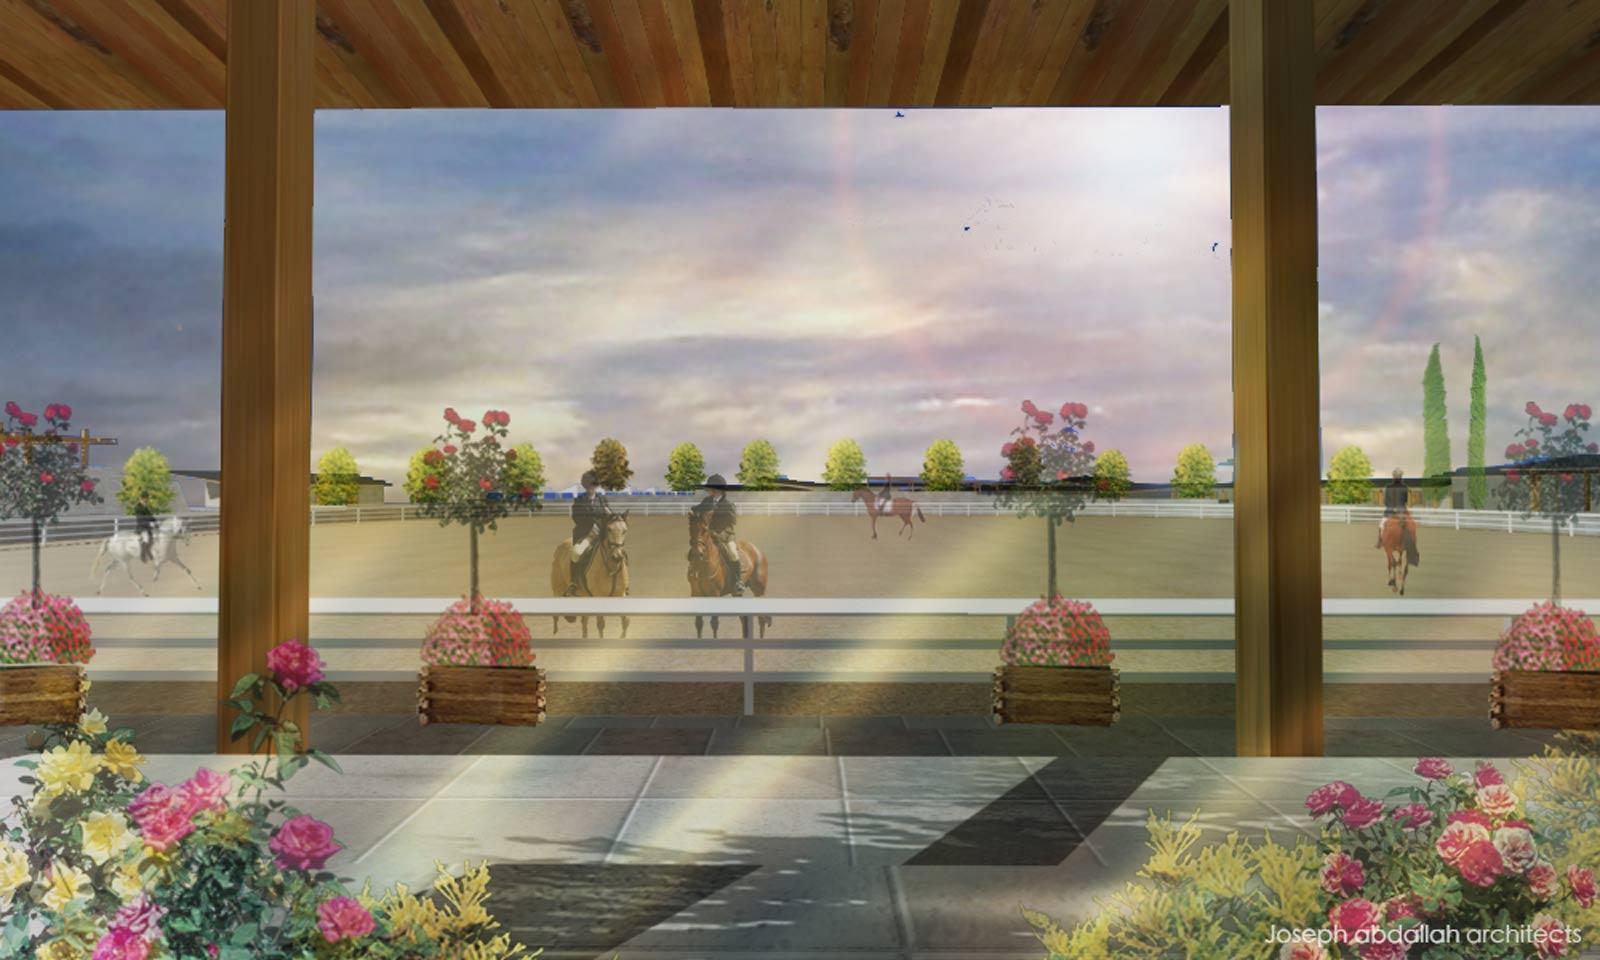 hechmi-equestrian-horse-back-riding-sport-lebanon-joseph-abdallah-architects-6